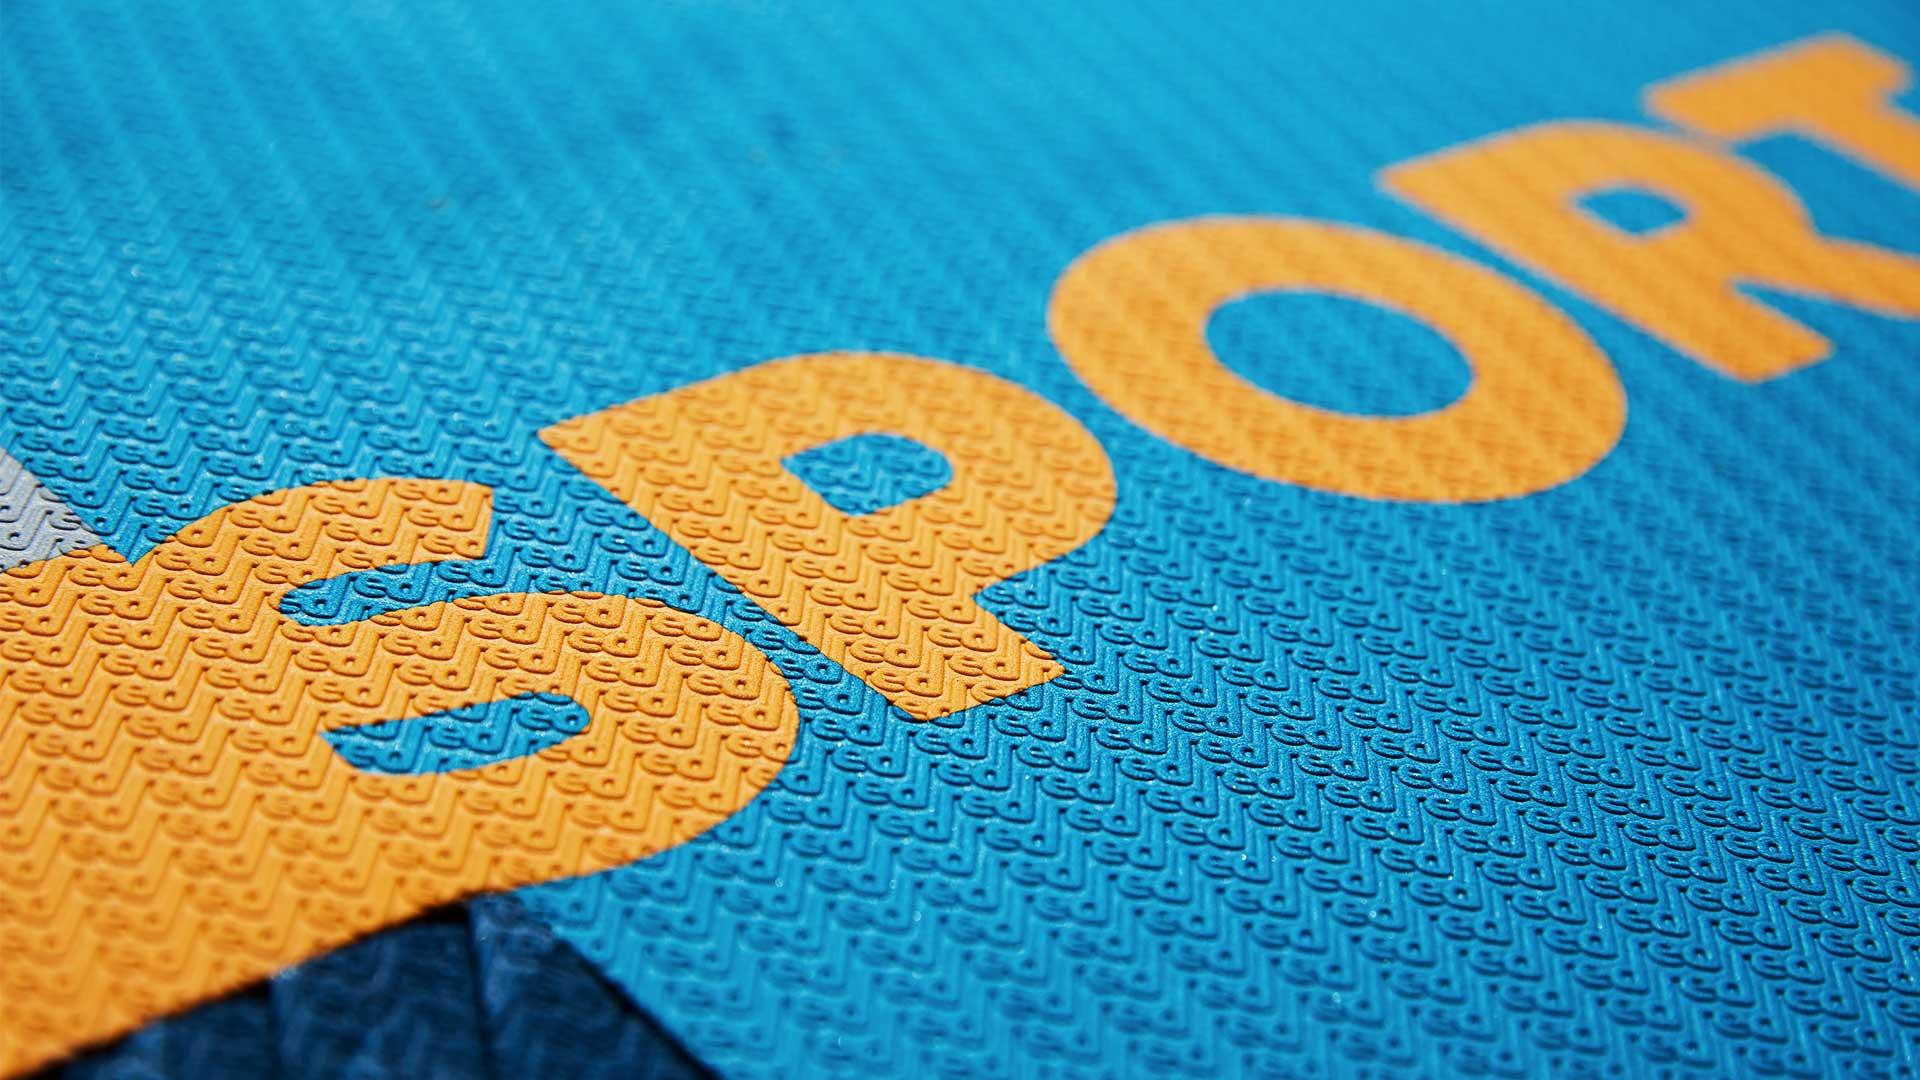 redpaddleco-126-sport-inflatable-paddle-board-desktop-gallery-deckpad